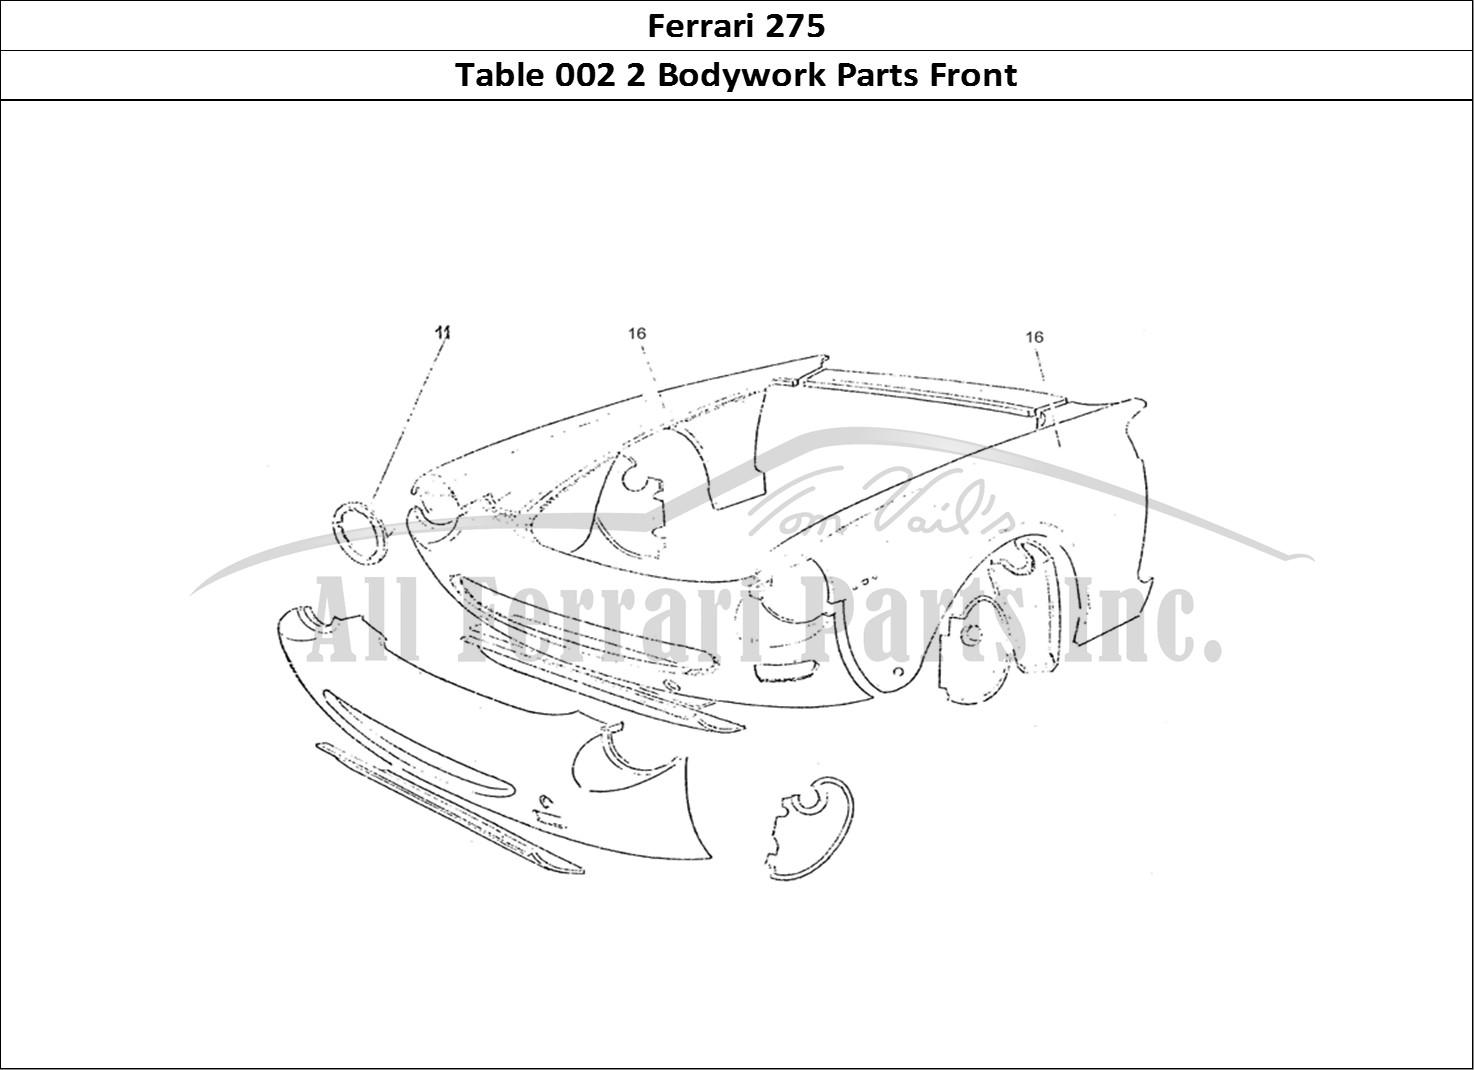 Buy original Ferrari 275 002 2 Bodywork Parts Front